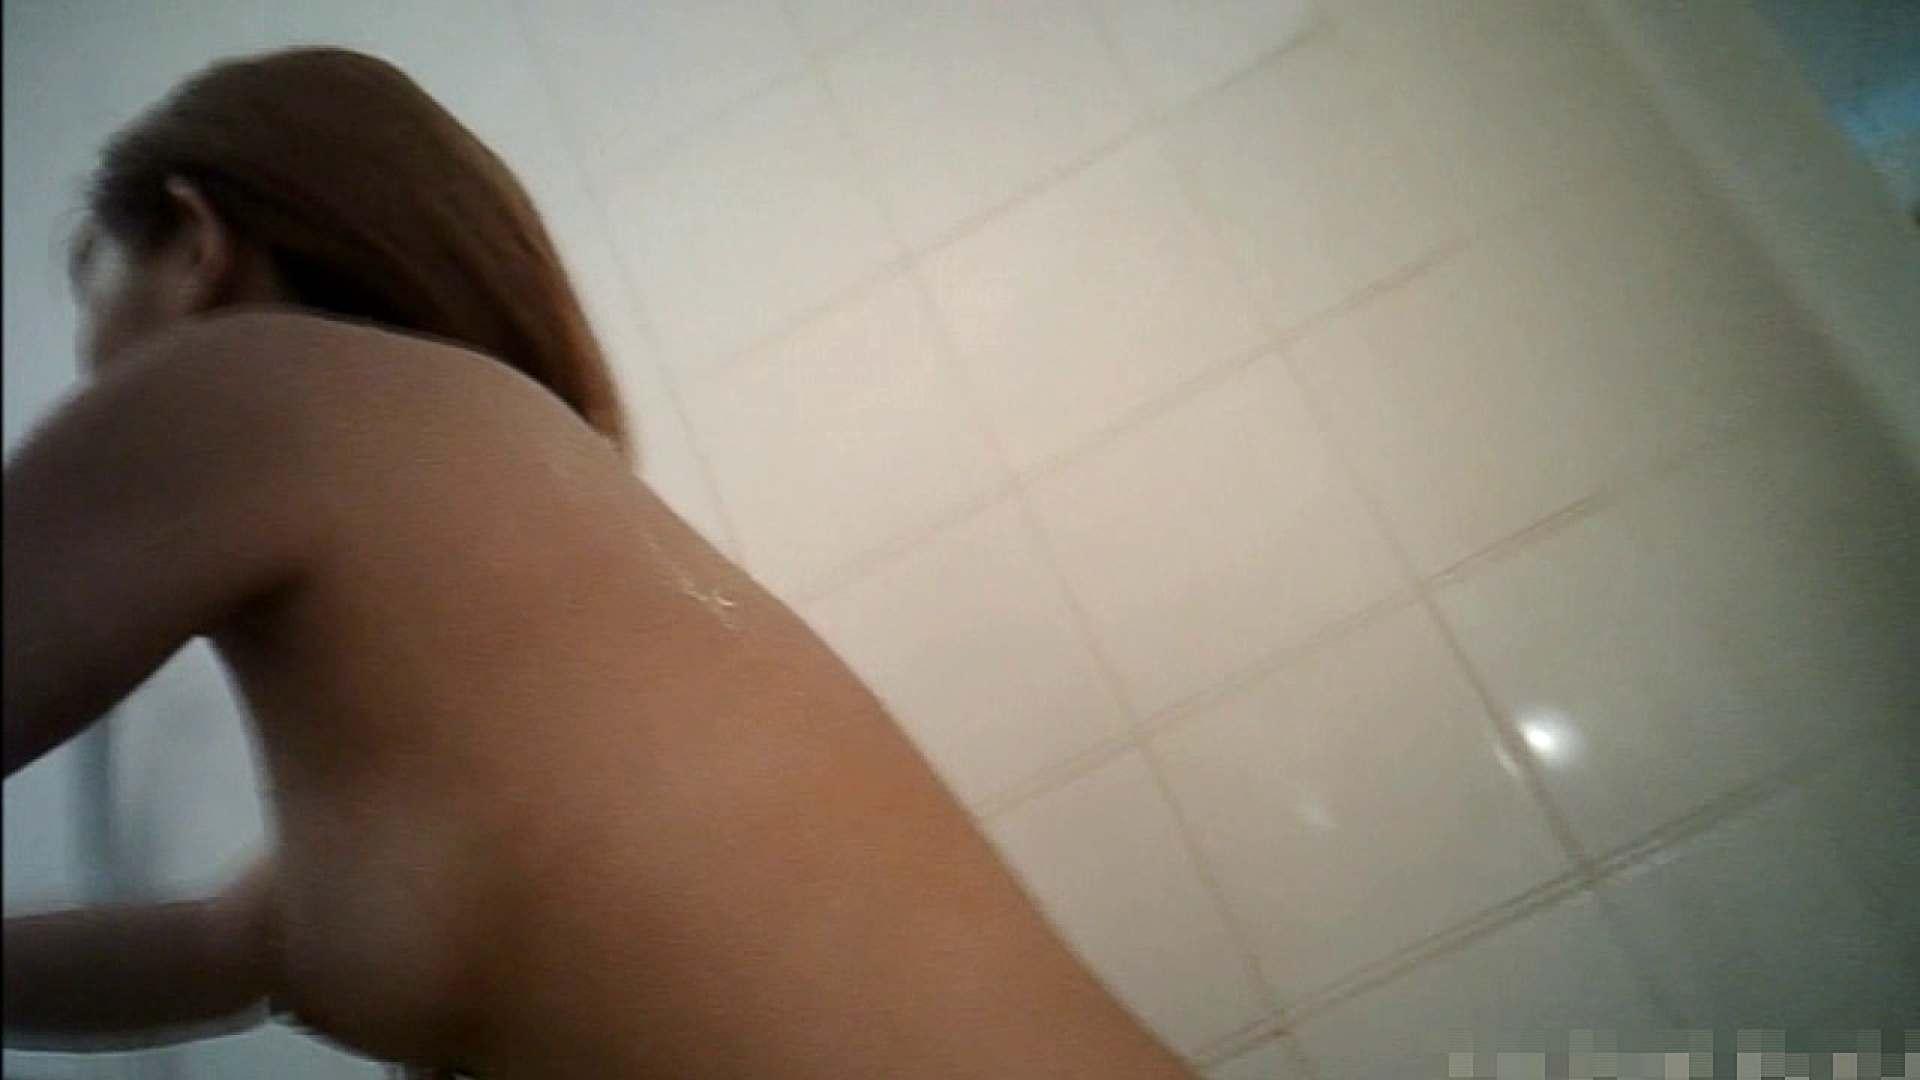 vol.7 【Mちゃん(入浴)】ブランド品査定士19歳 巨乳ギャル 友人・知人 おまんこ動画流出 99枚 61